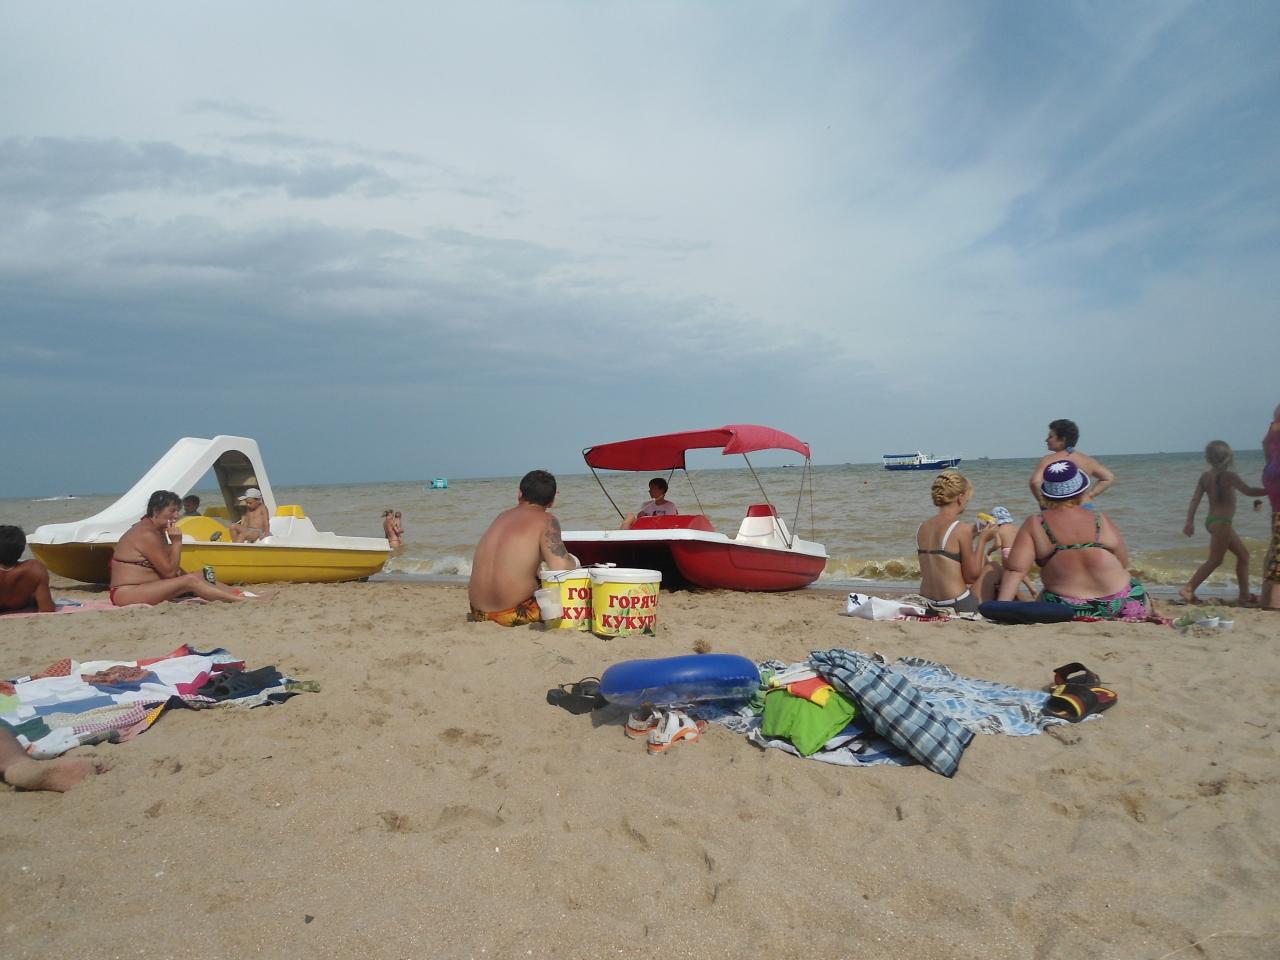 Фото пляжи в урзуфе азовское море